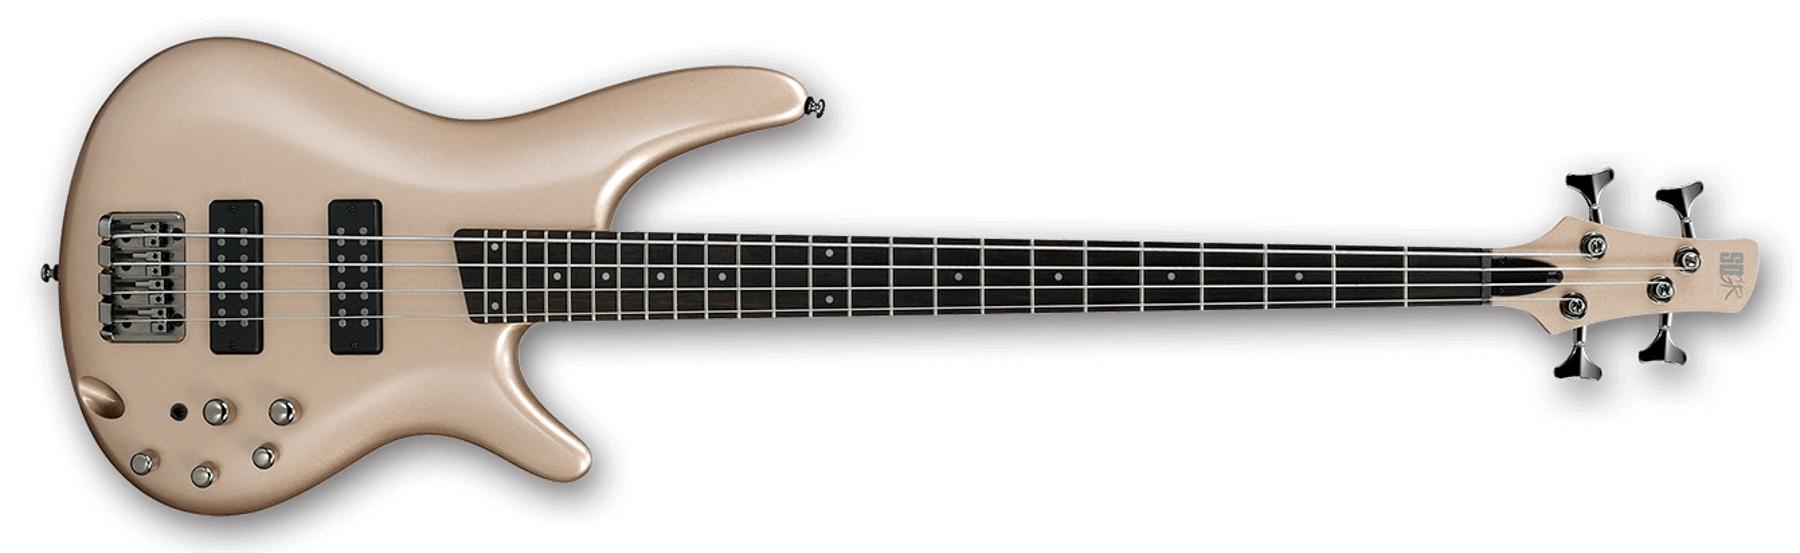 Fantastic Bass Pickup Configurations Big Dimarzio Pickup Wiring Flat Electric Guitar Wire Dimarzio Wiring Colors Youthful Guitar Tone Wiring ColouredIbanez Humbuckers Ibanez SR300E Bass Guitar 4 String | Full Compass